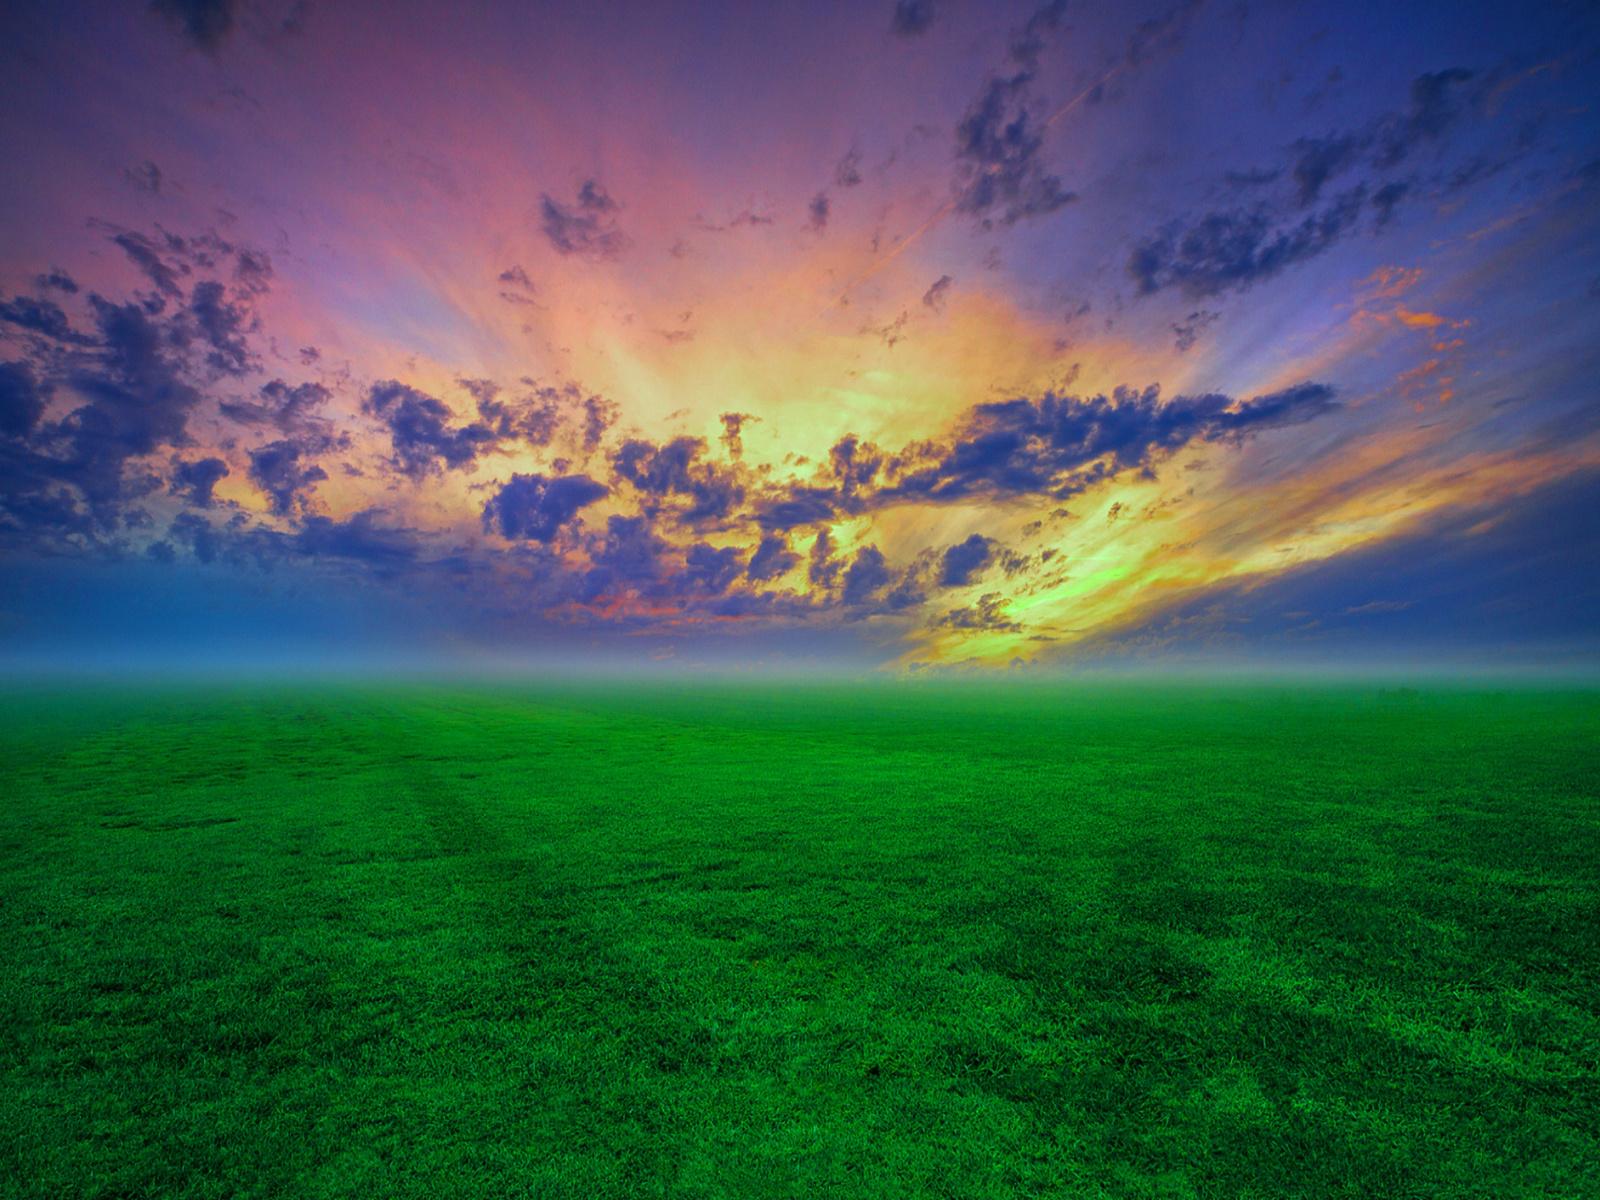 пейзаж, трава, облака